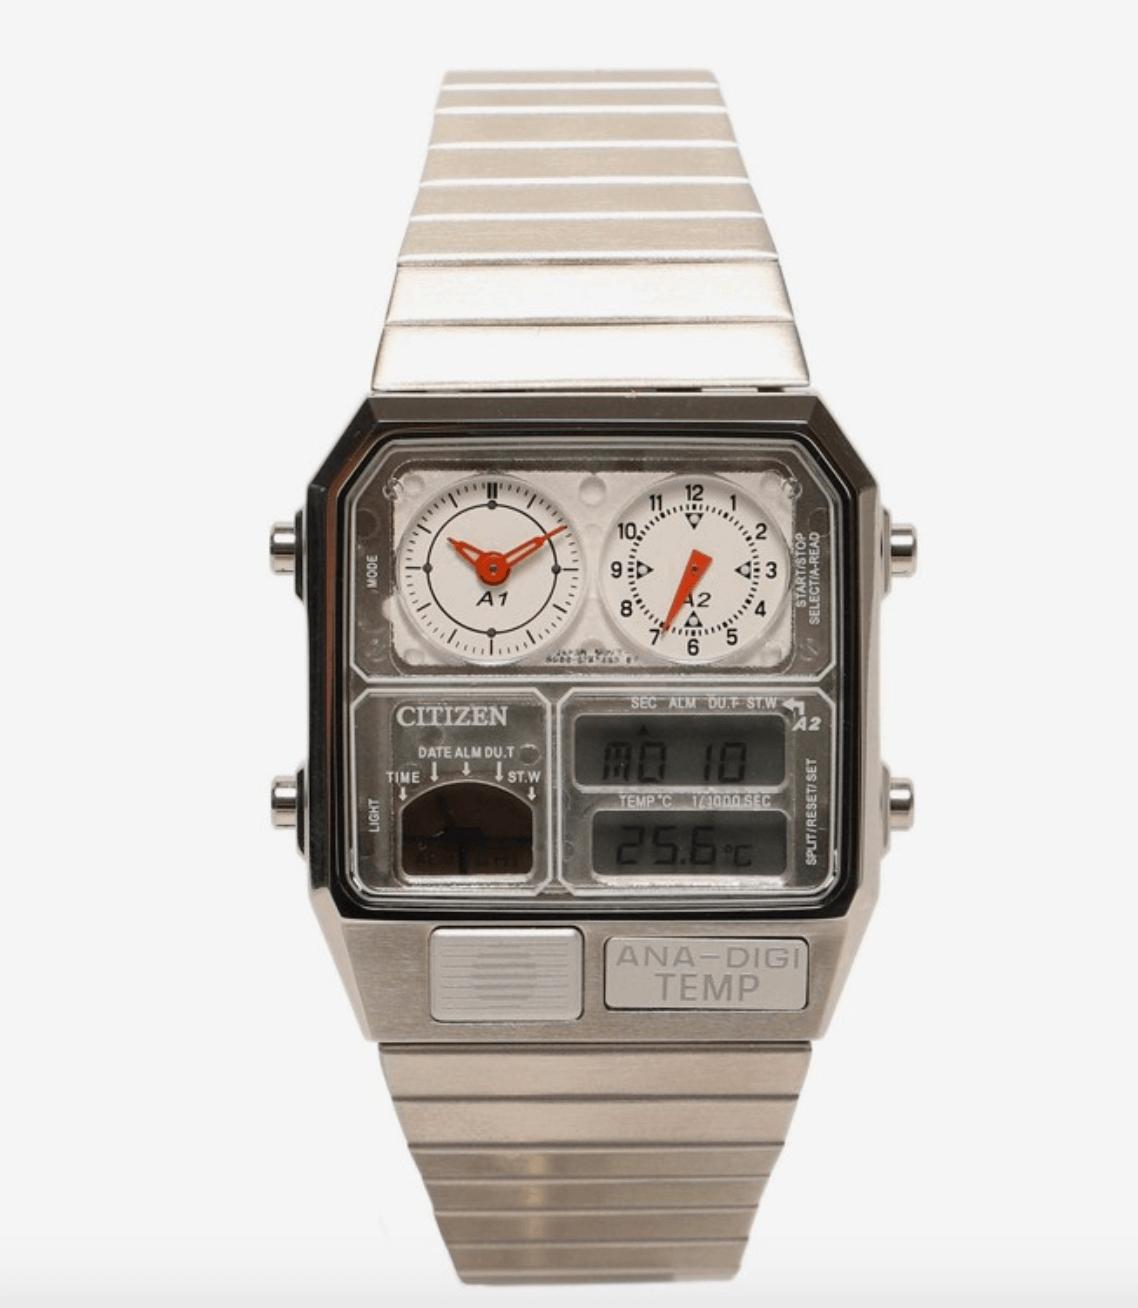 Citizen x BEAMS Ana-Digi Temp Wristwatch 2020